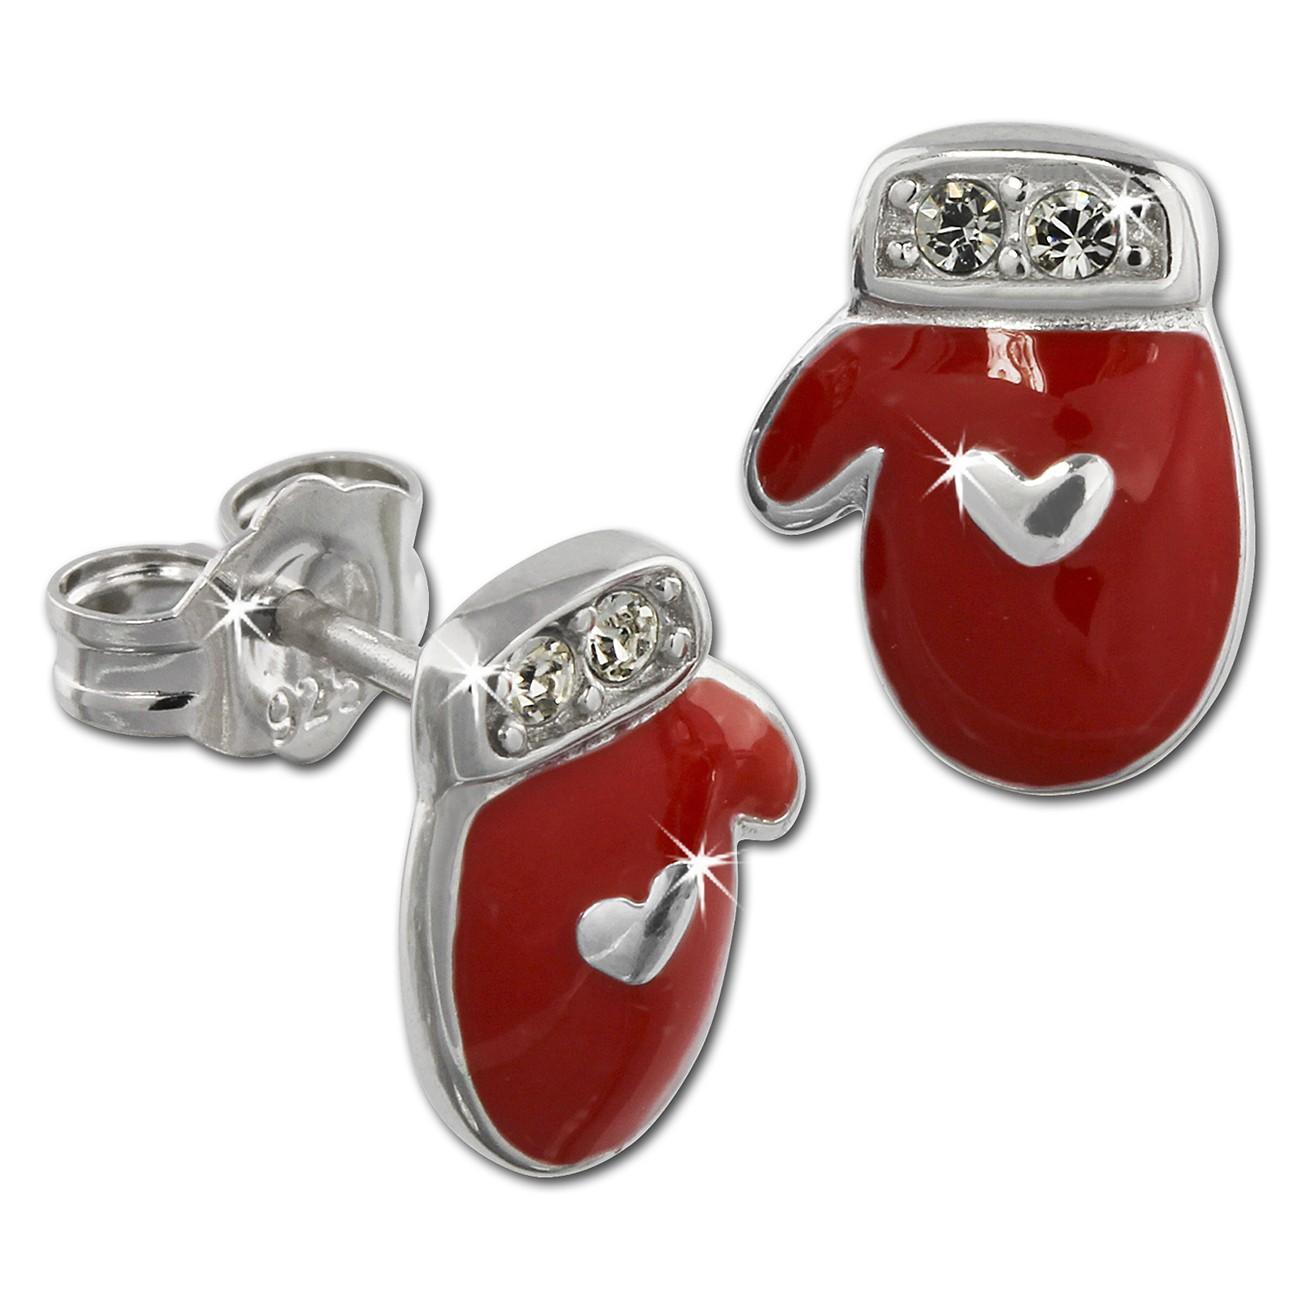 Kinder Ohrring Fausthandschuhe rot Silber Ohrstecker Kinderschmuck TW SDO614R